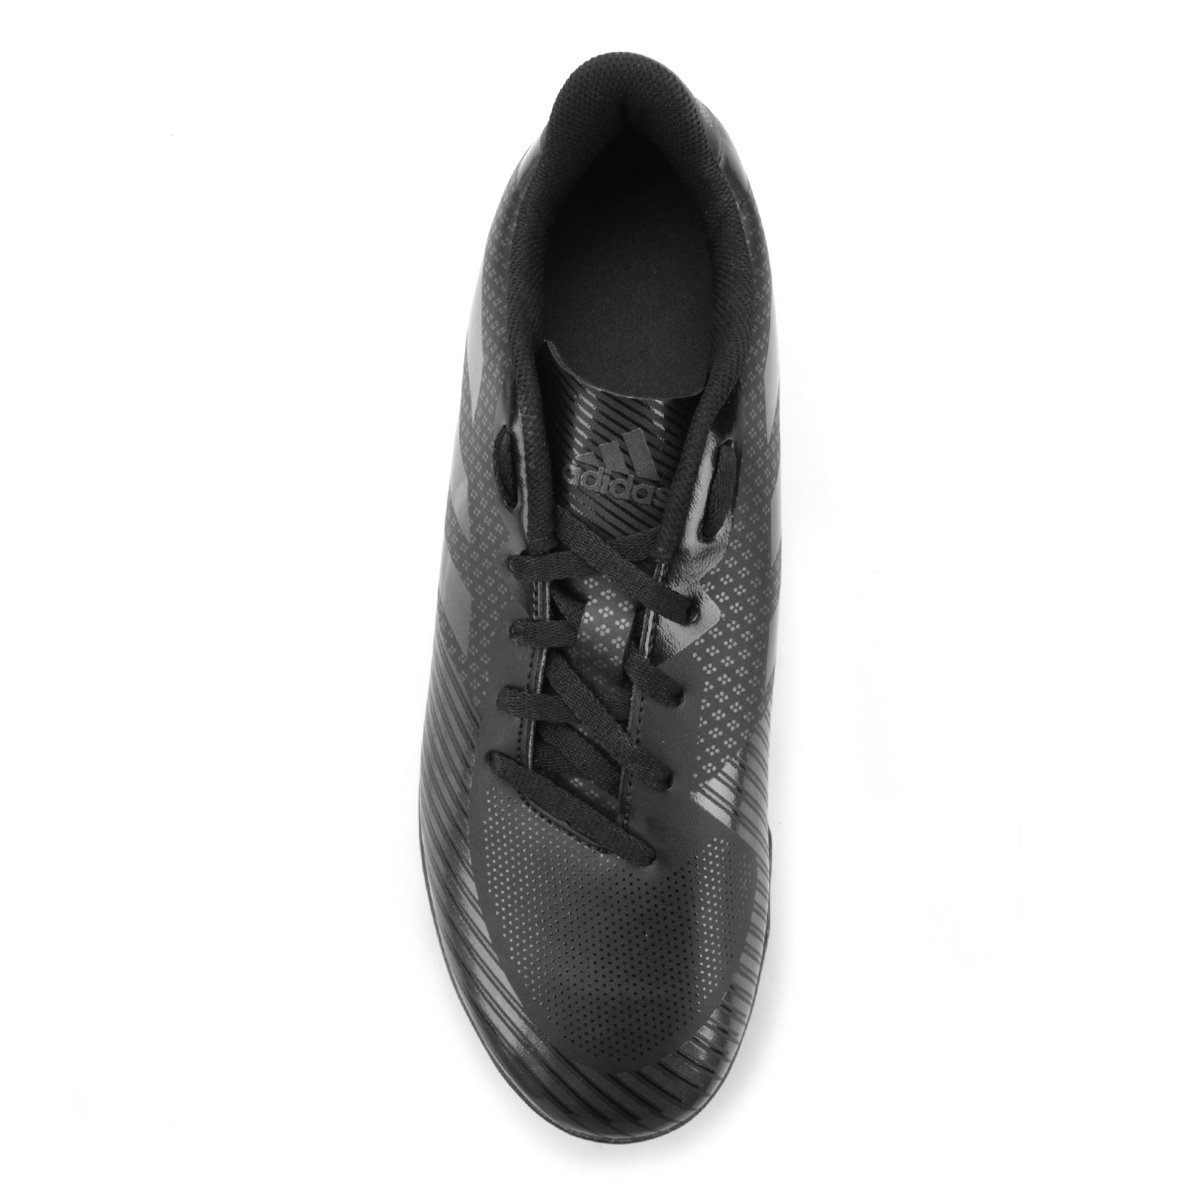 ... Chuteira Chuteira Society TF Masculina 18 Adidas Artilheira Preto  Society UUrOTwBRq ... 85fa00136ef4c